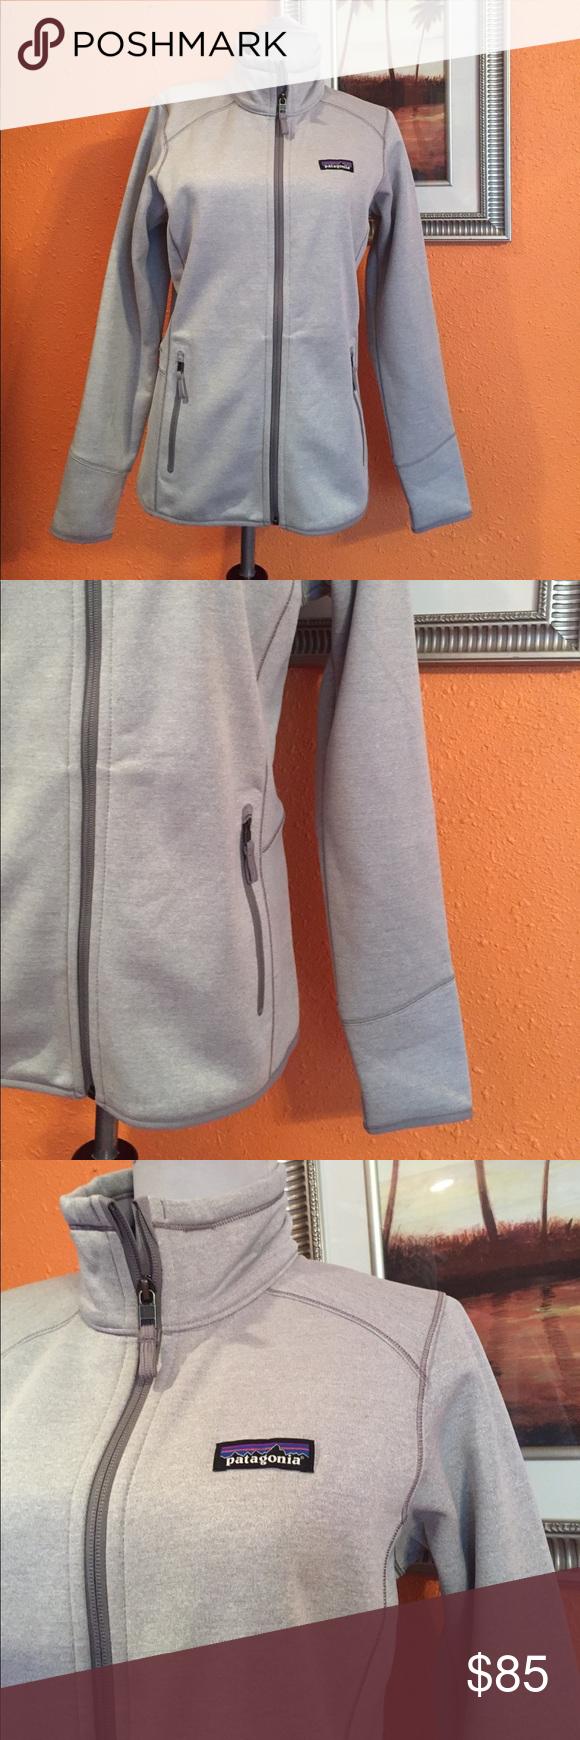 Women tech fleece jacket Nice light grey with zipper